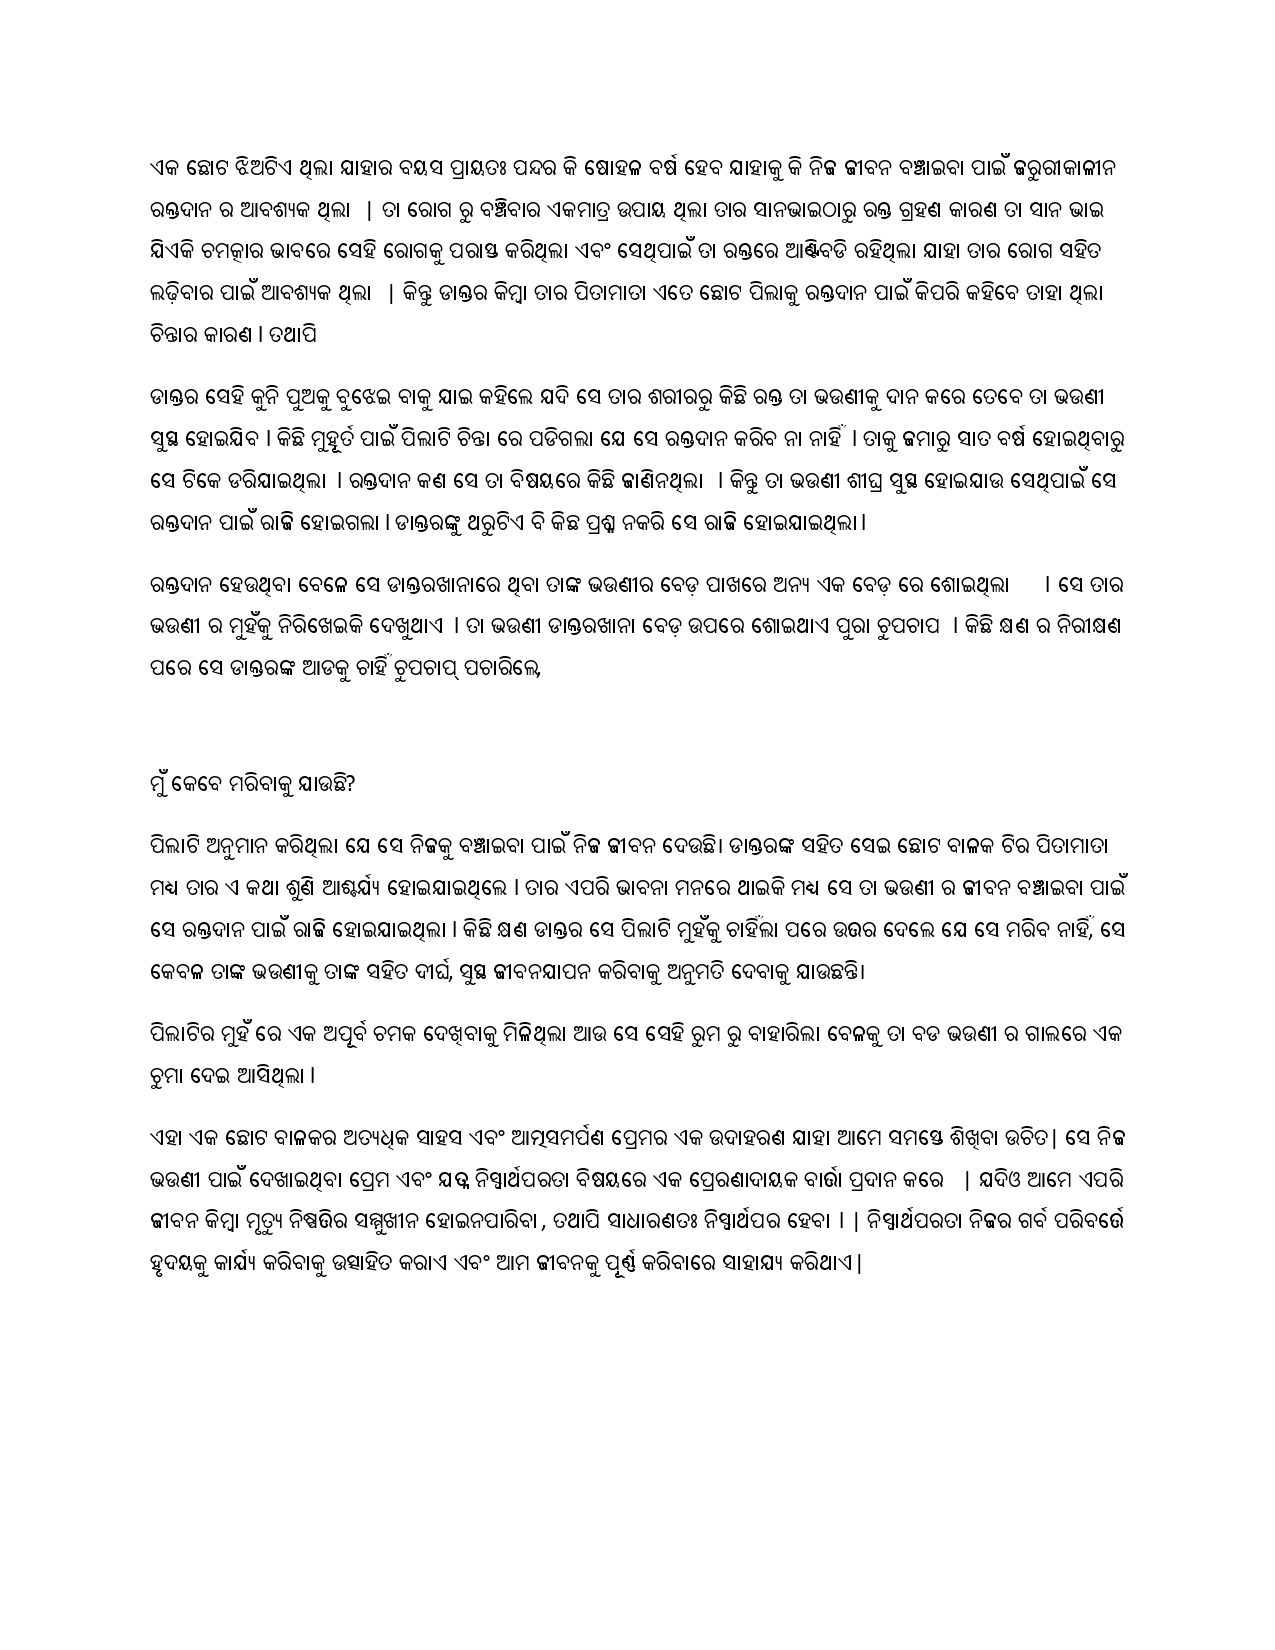 Odia Story For Child PDF, odia short story for child pdf